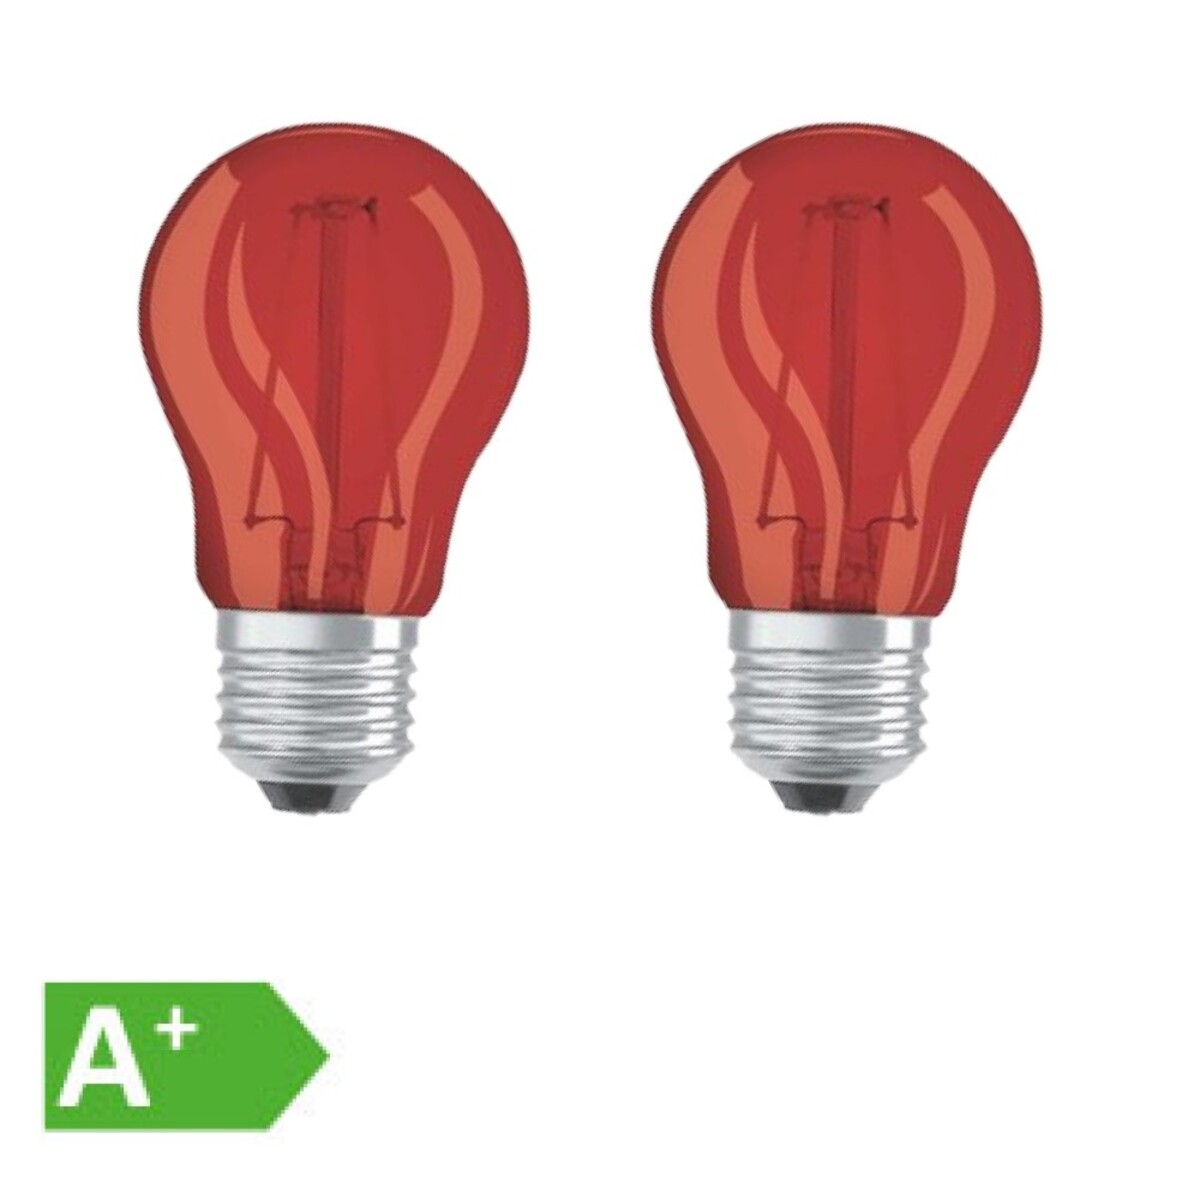 Bild 1 von Osram LED Filament Leuchtmittel Tropfen bunt 1,6W = 15W E27 rot 2er Set